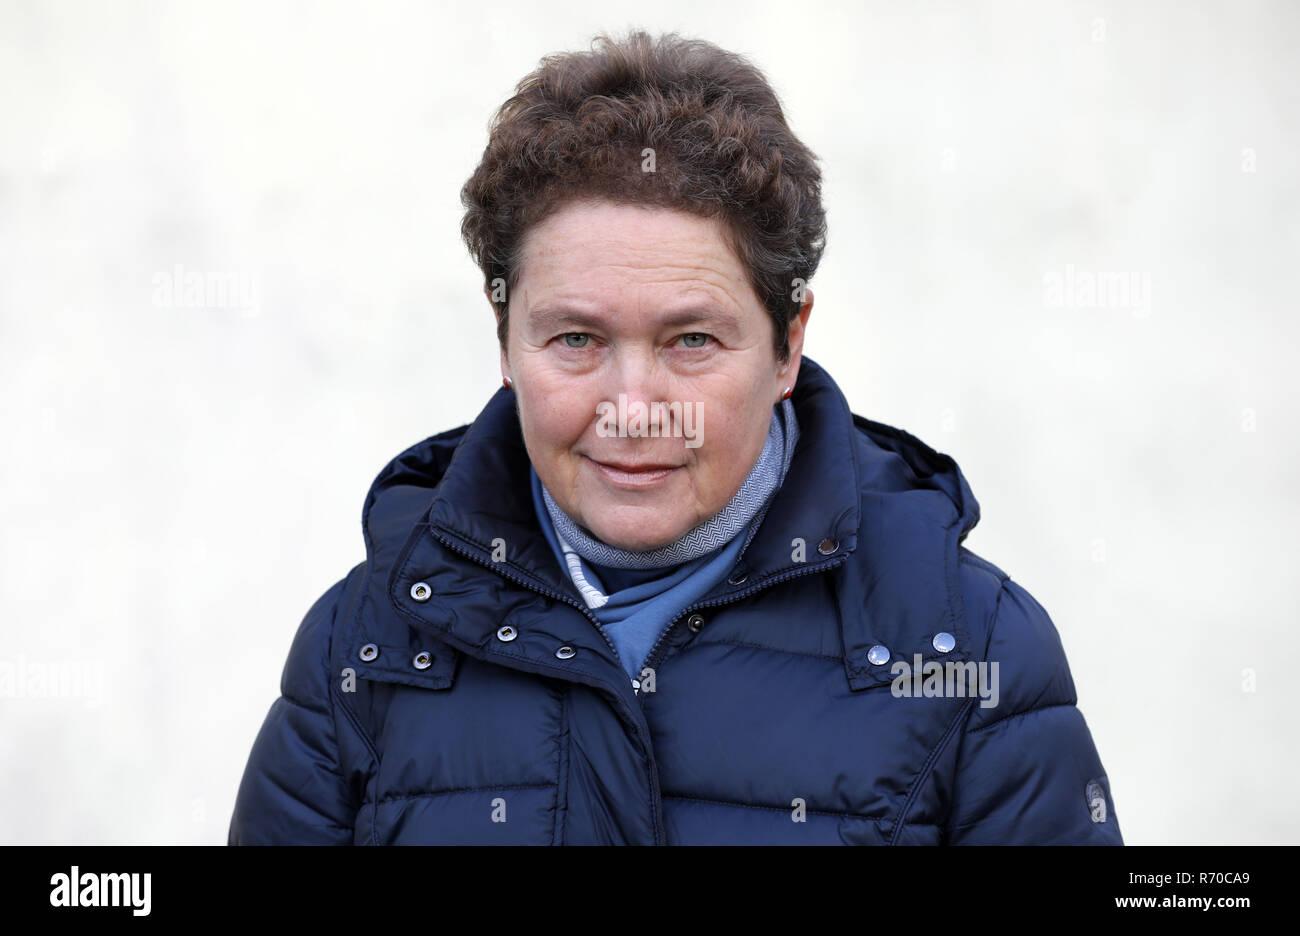 Birgit Tetzlaff